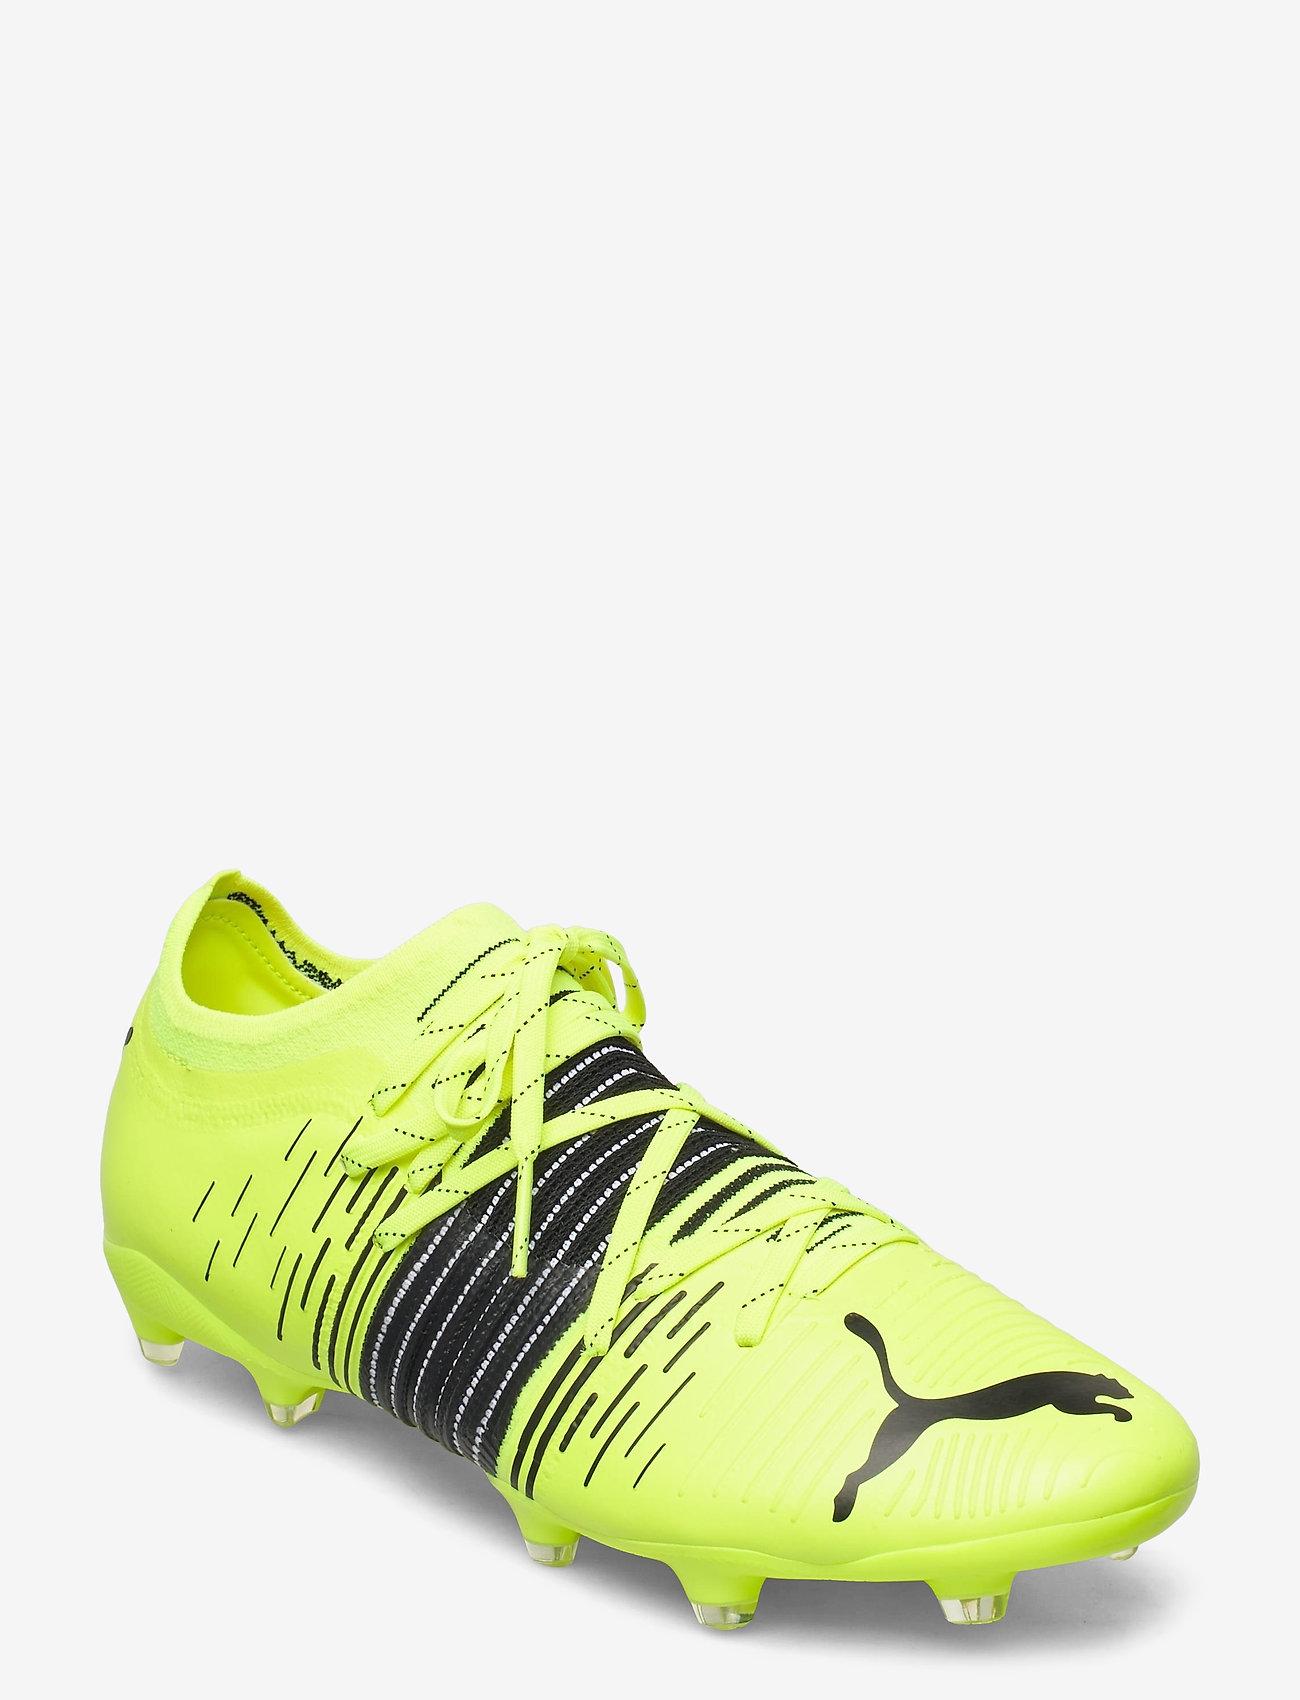 PUMA - FUTURE Z 2.1 FG/AG - fodboldsko - yellow alert-puma black-puma white - 0